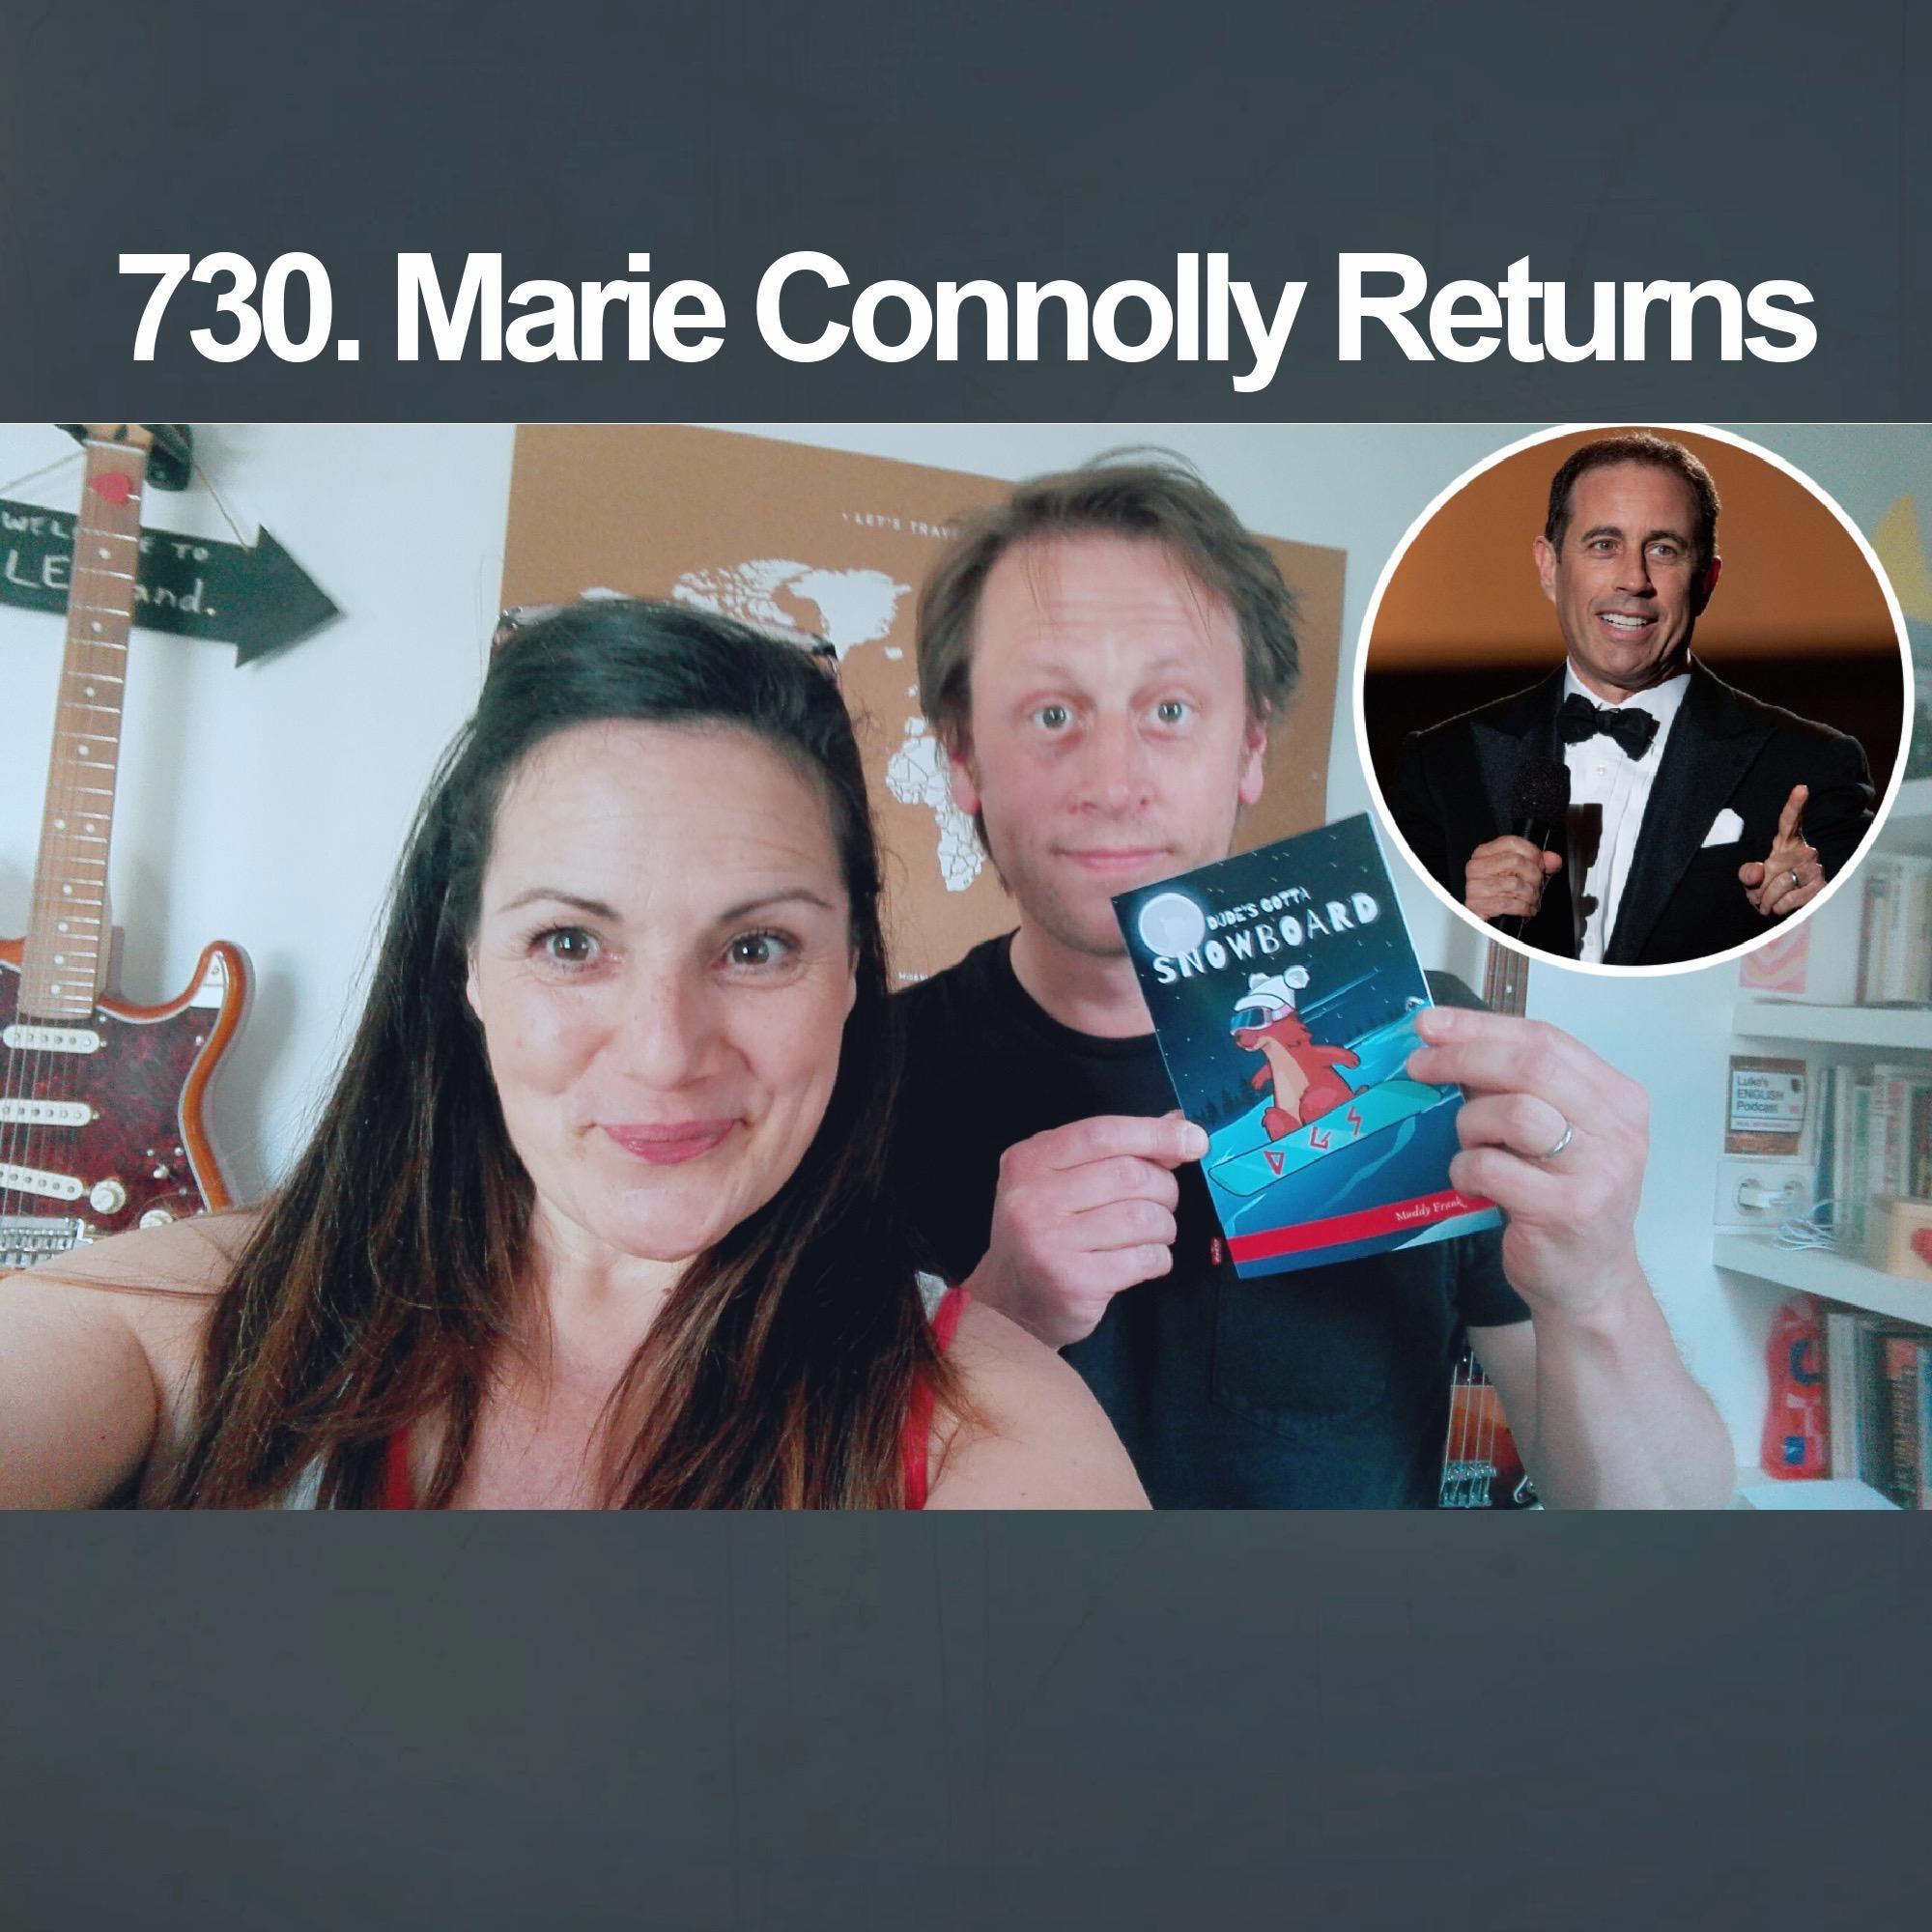 730. Marie Connolly Returns (+ 2 songs)